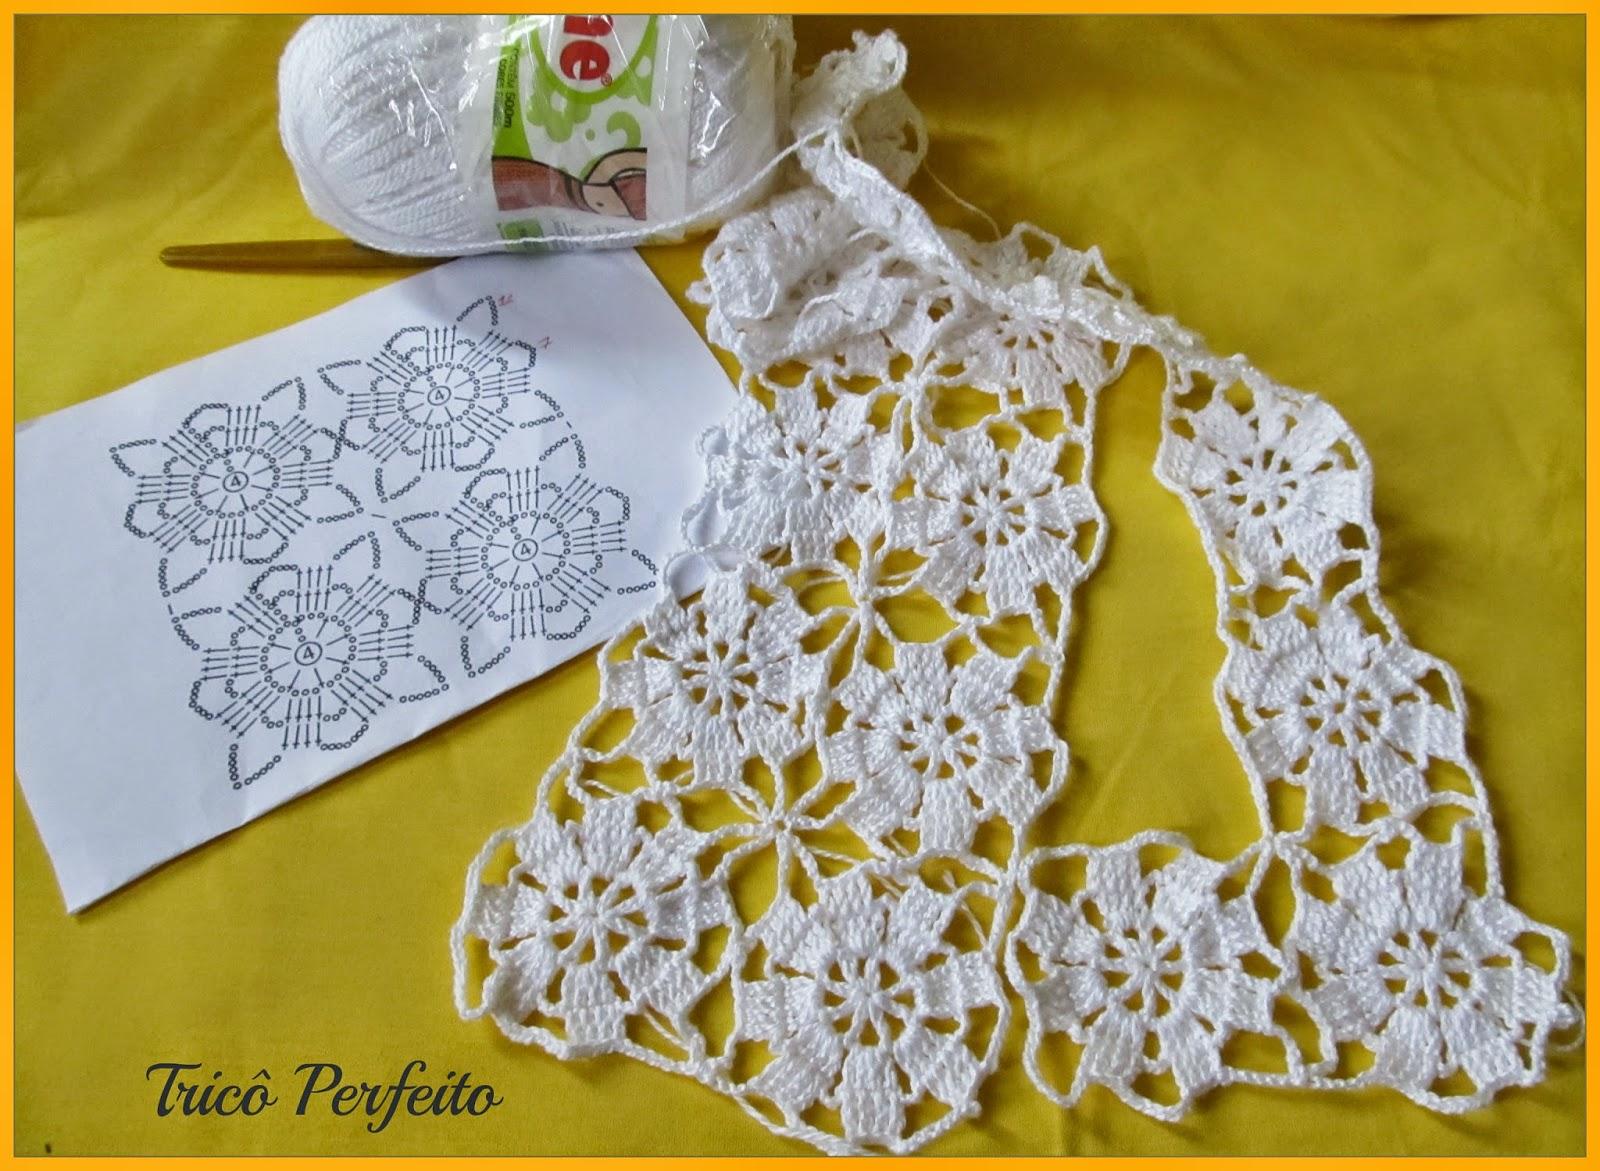 Motivo de crochet, fácil e rápido